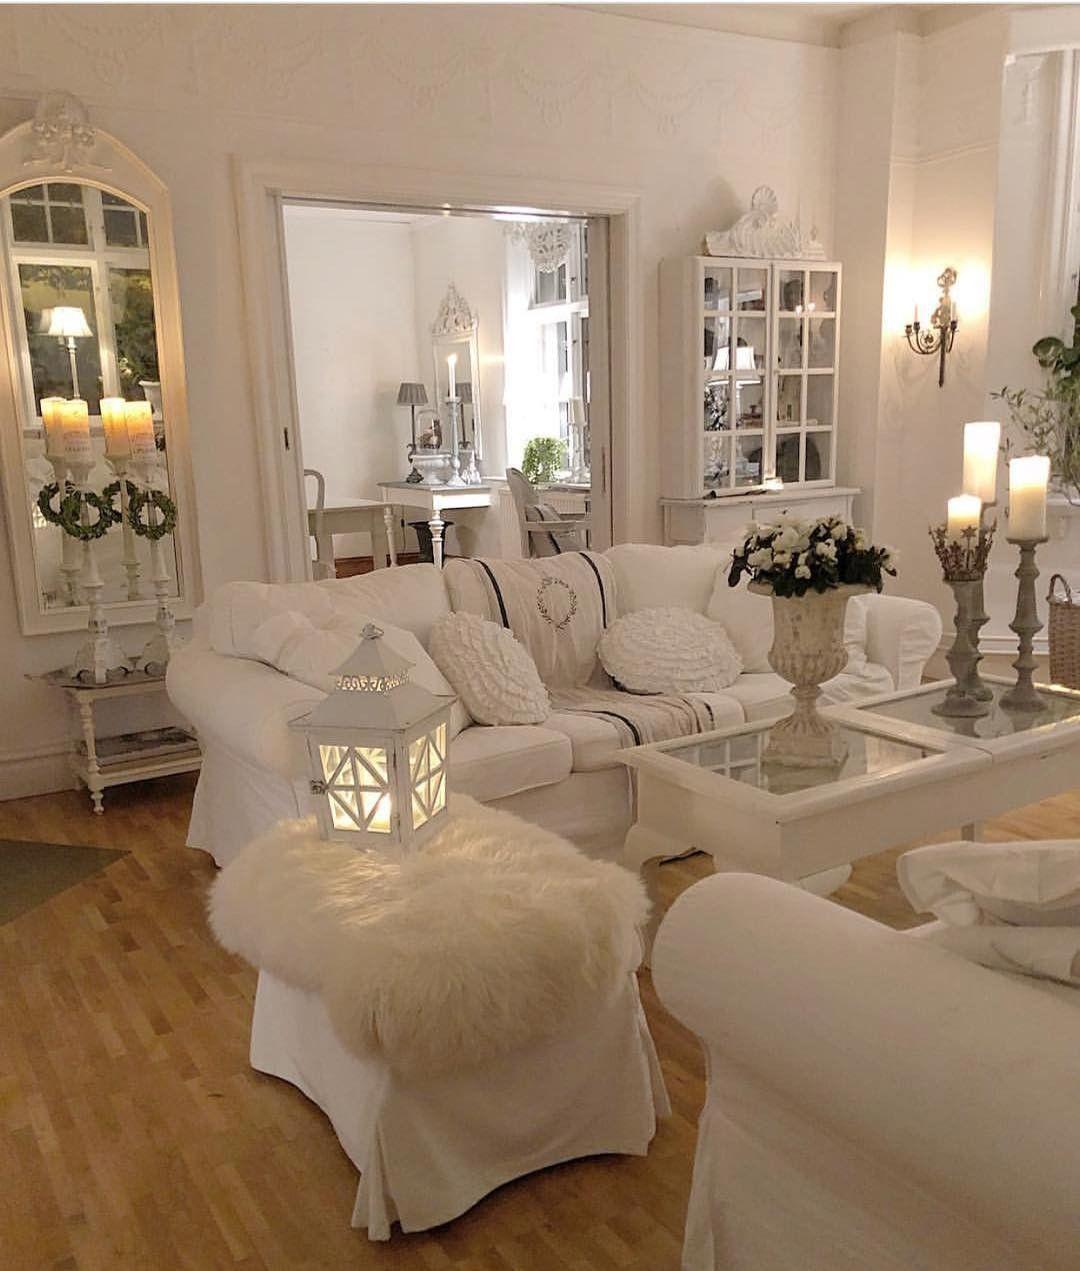 Cucina Soggiorno Shabby Chic | Lampadari Shabby Chic Ikea Home ...